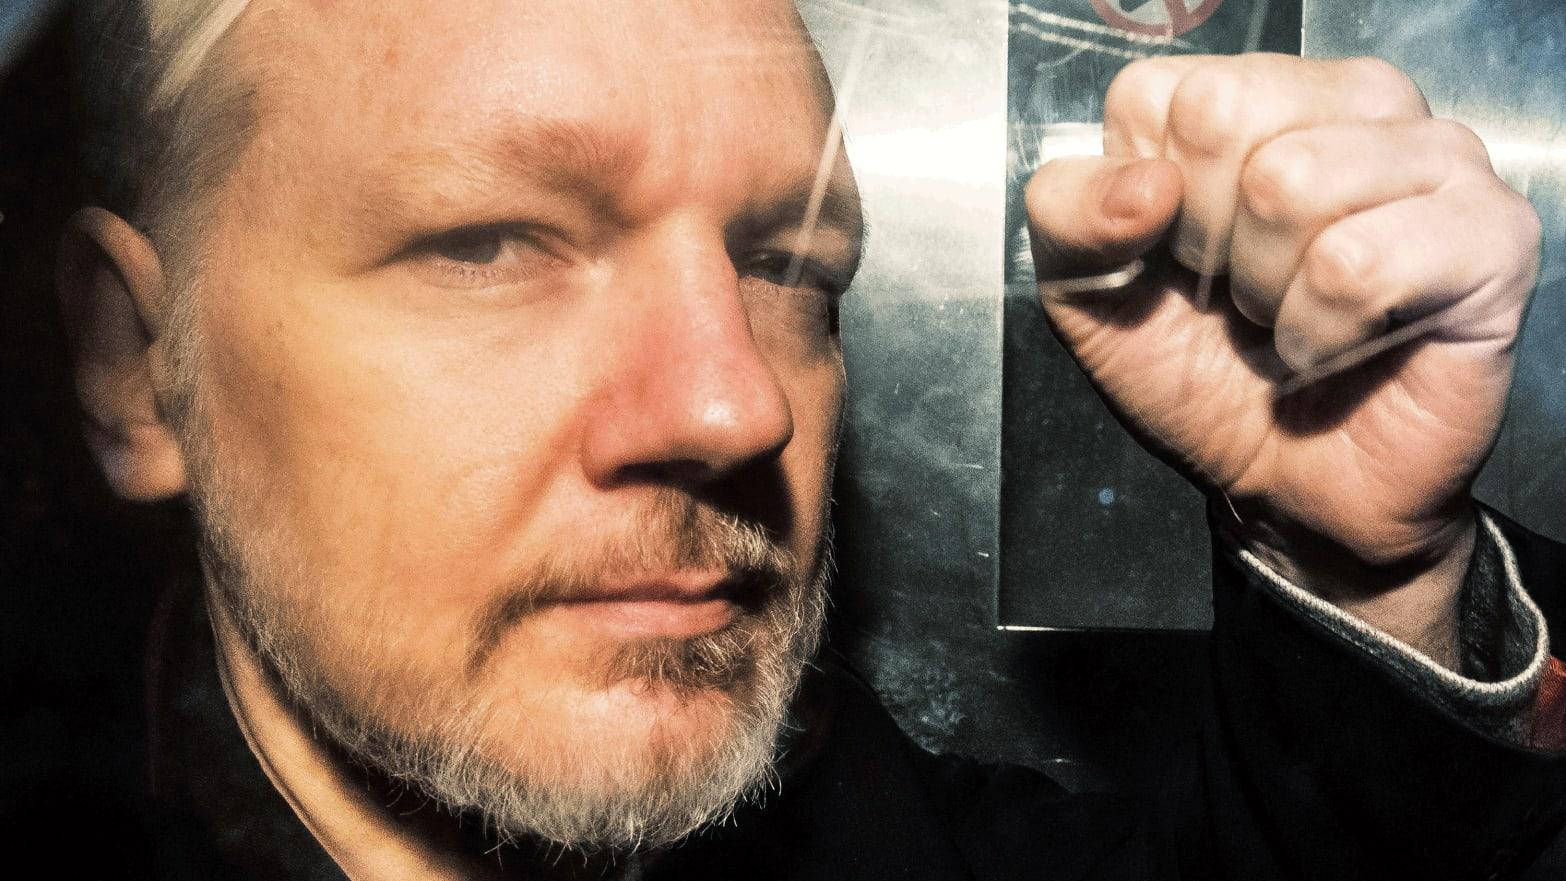 U.S. Charges WikiLeak's Julian Assange With Publishing Classified Info